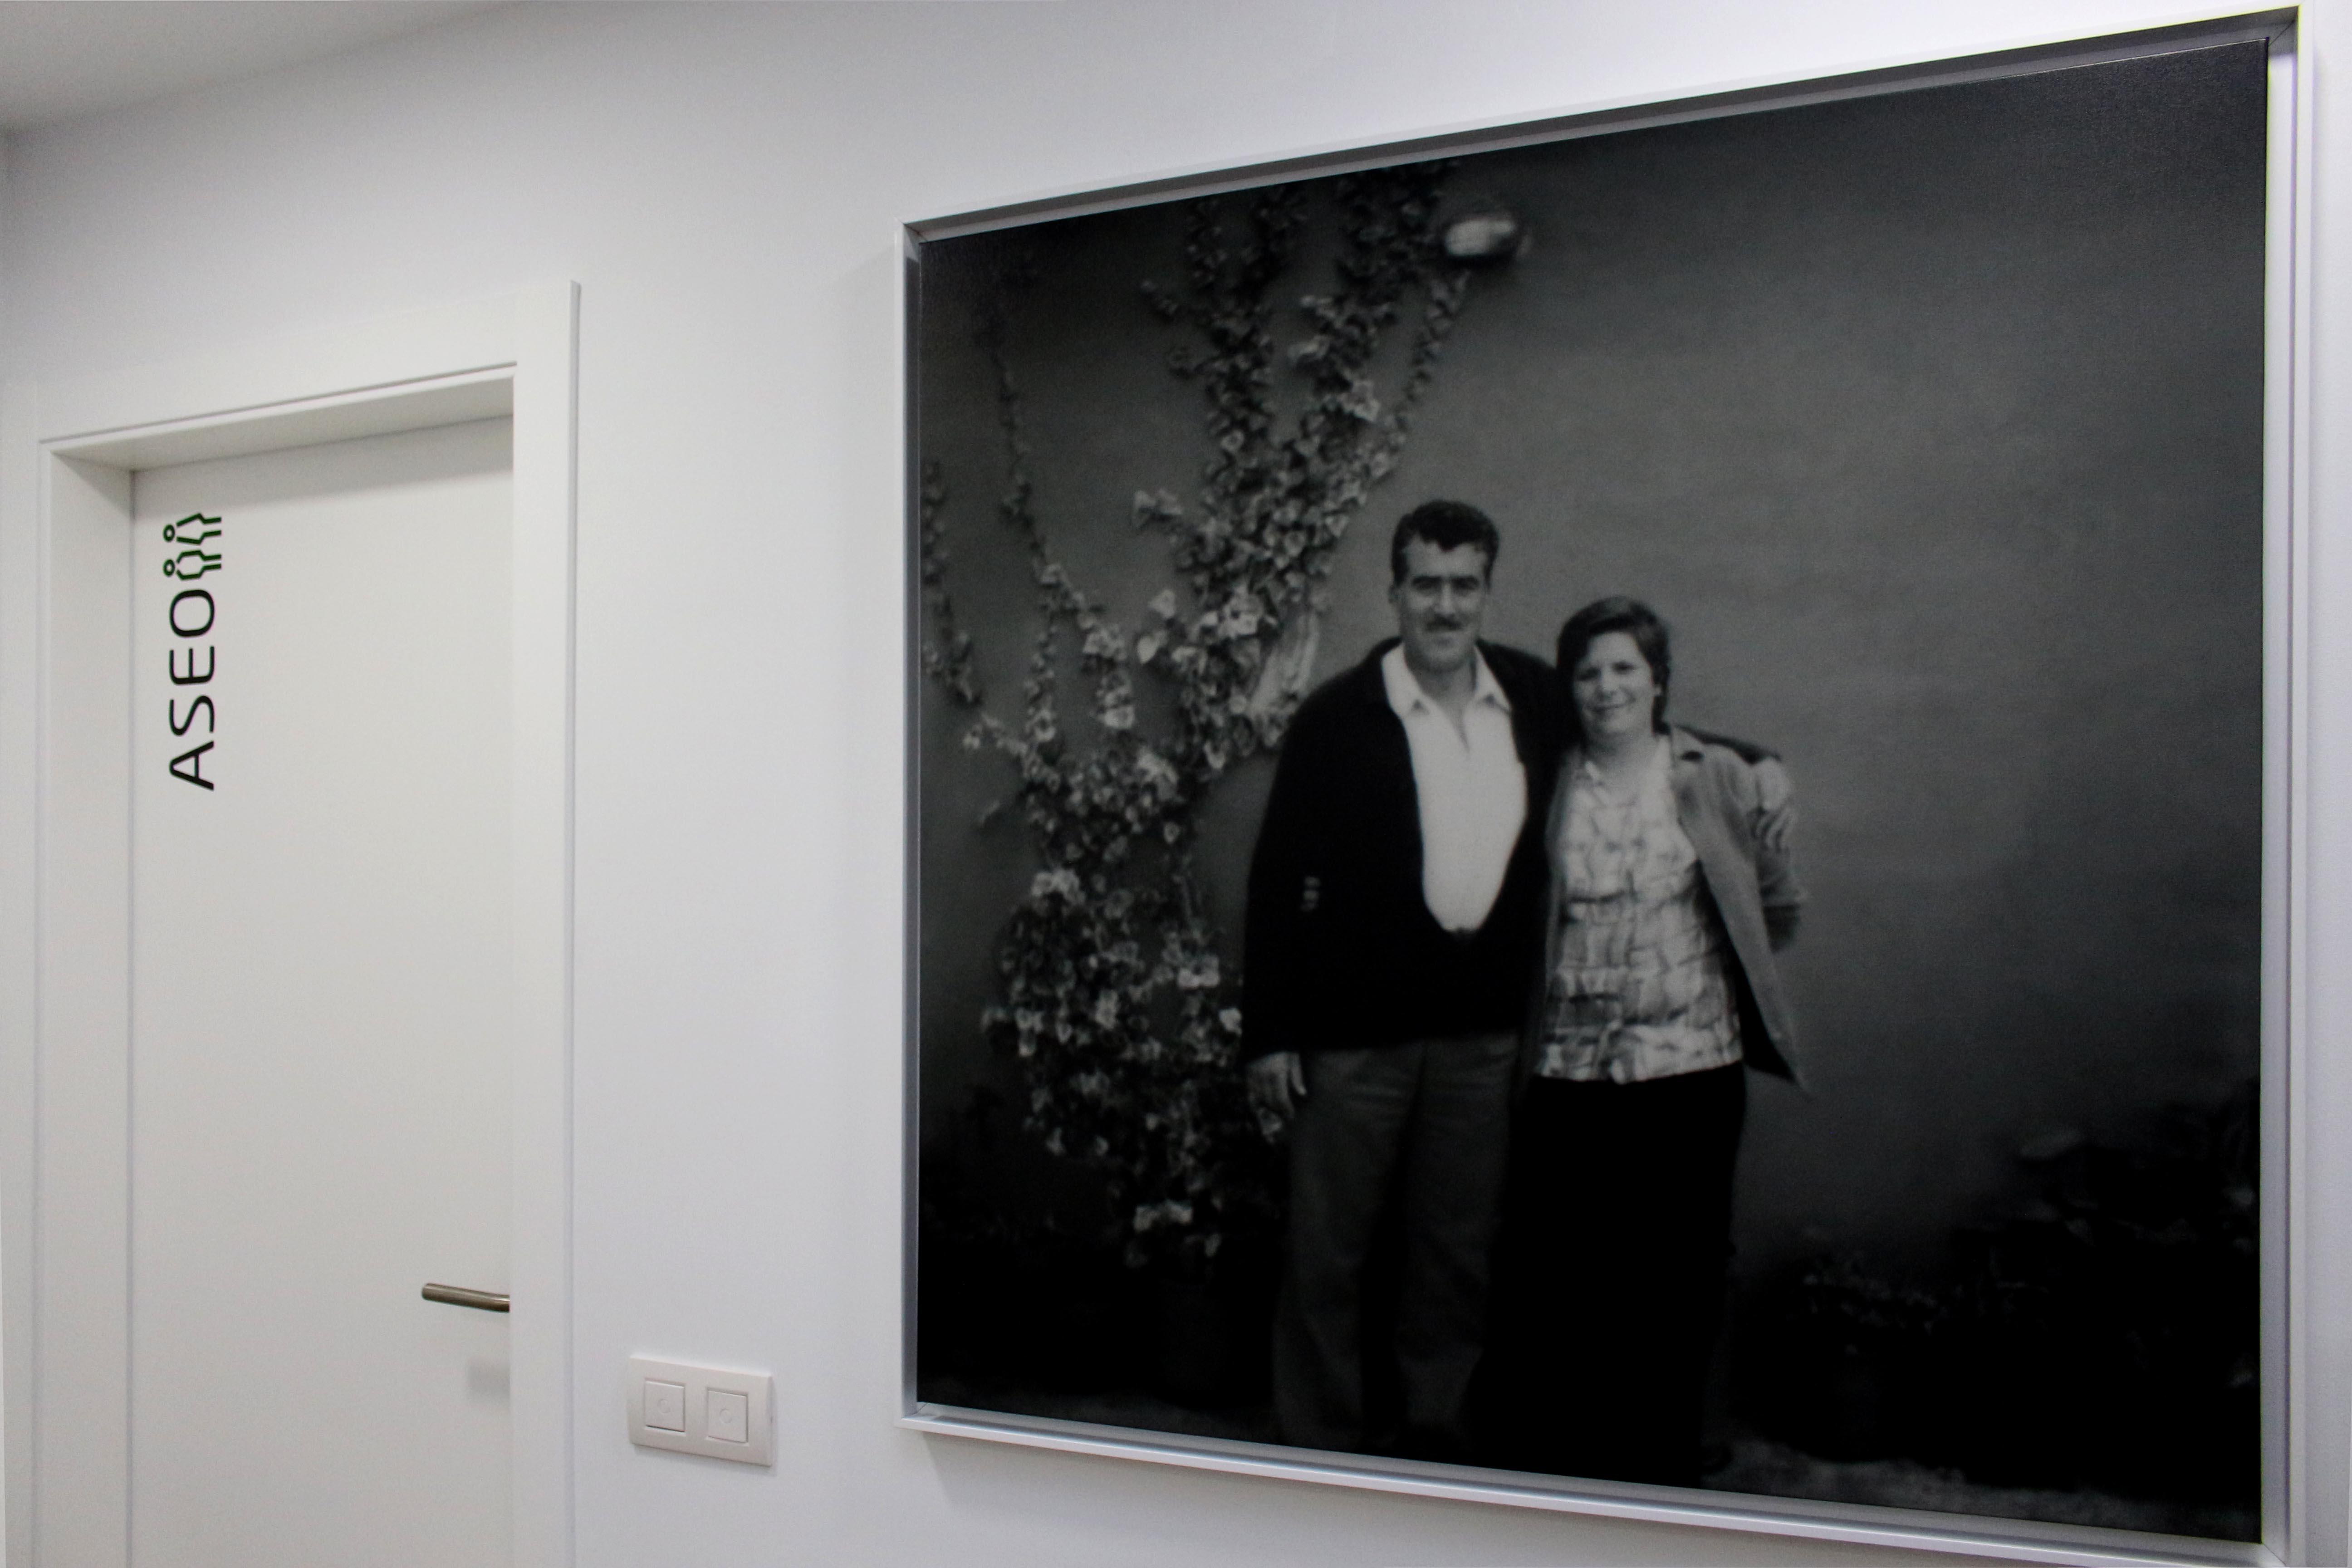 Impresión de lienzos sobre bastidores a medida, Atelier Coworking, Tacoronte, Tenerife